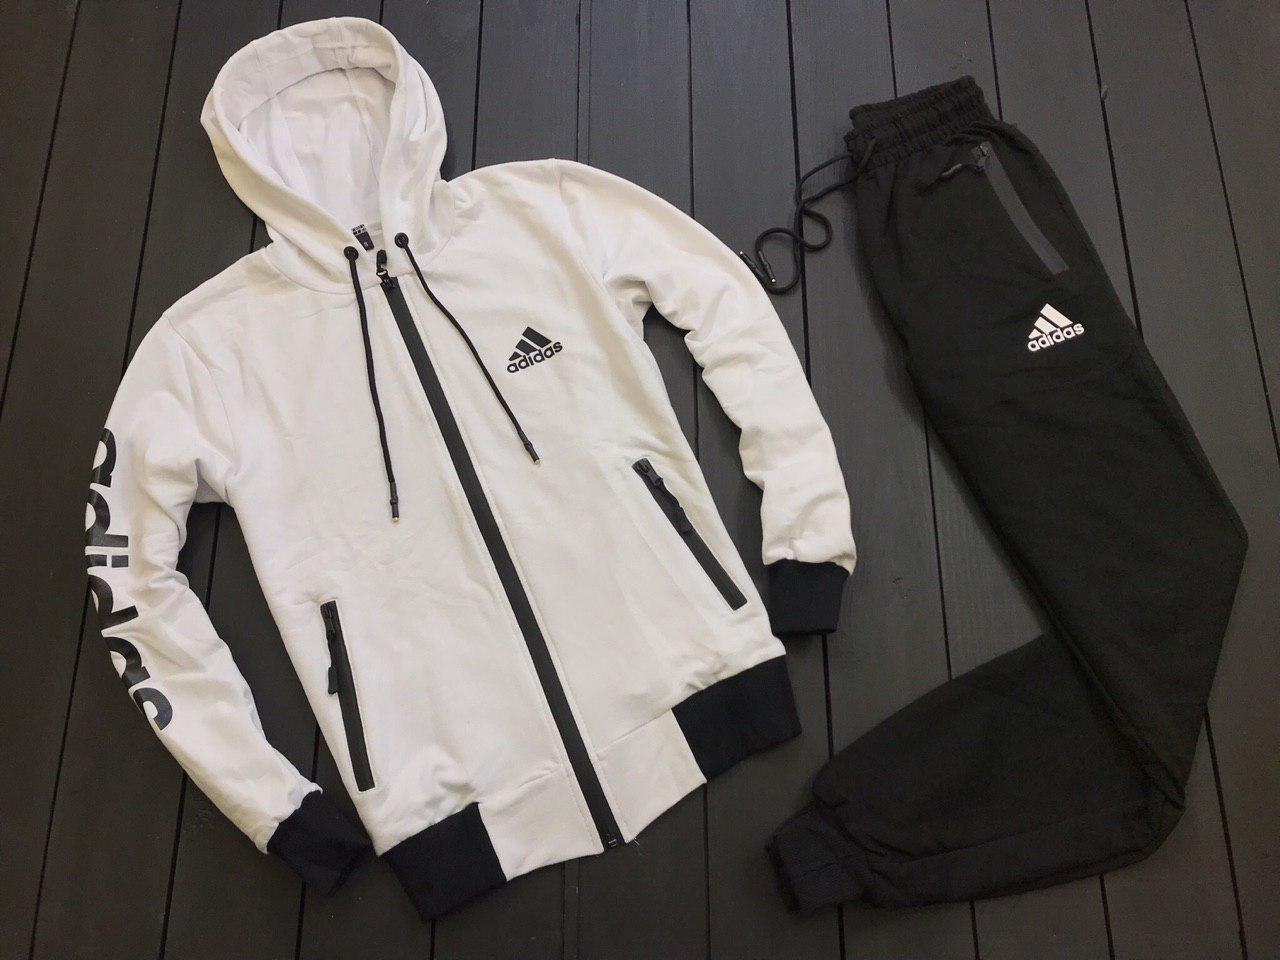 0f954400d8ad29 Спортивный костюм мужской в стиле Adidas весенний / осенний Black-White -  Panda-shop